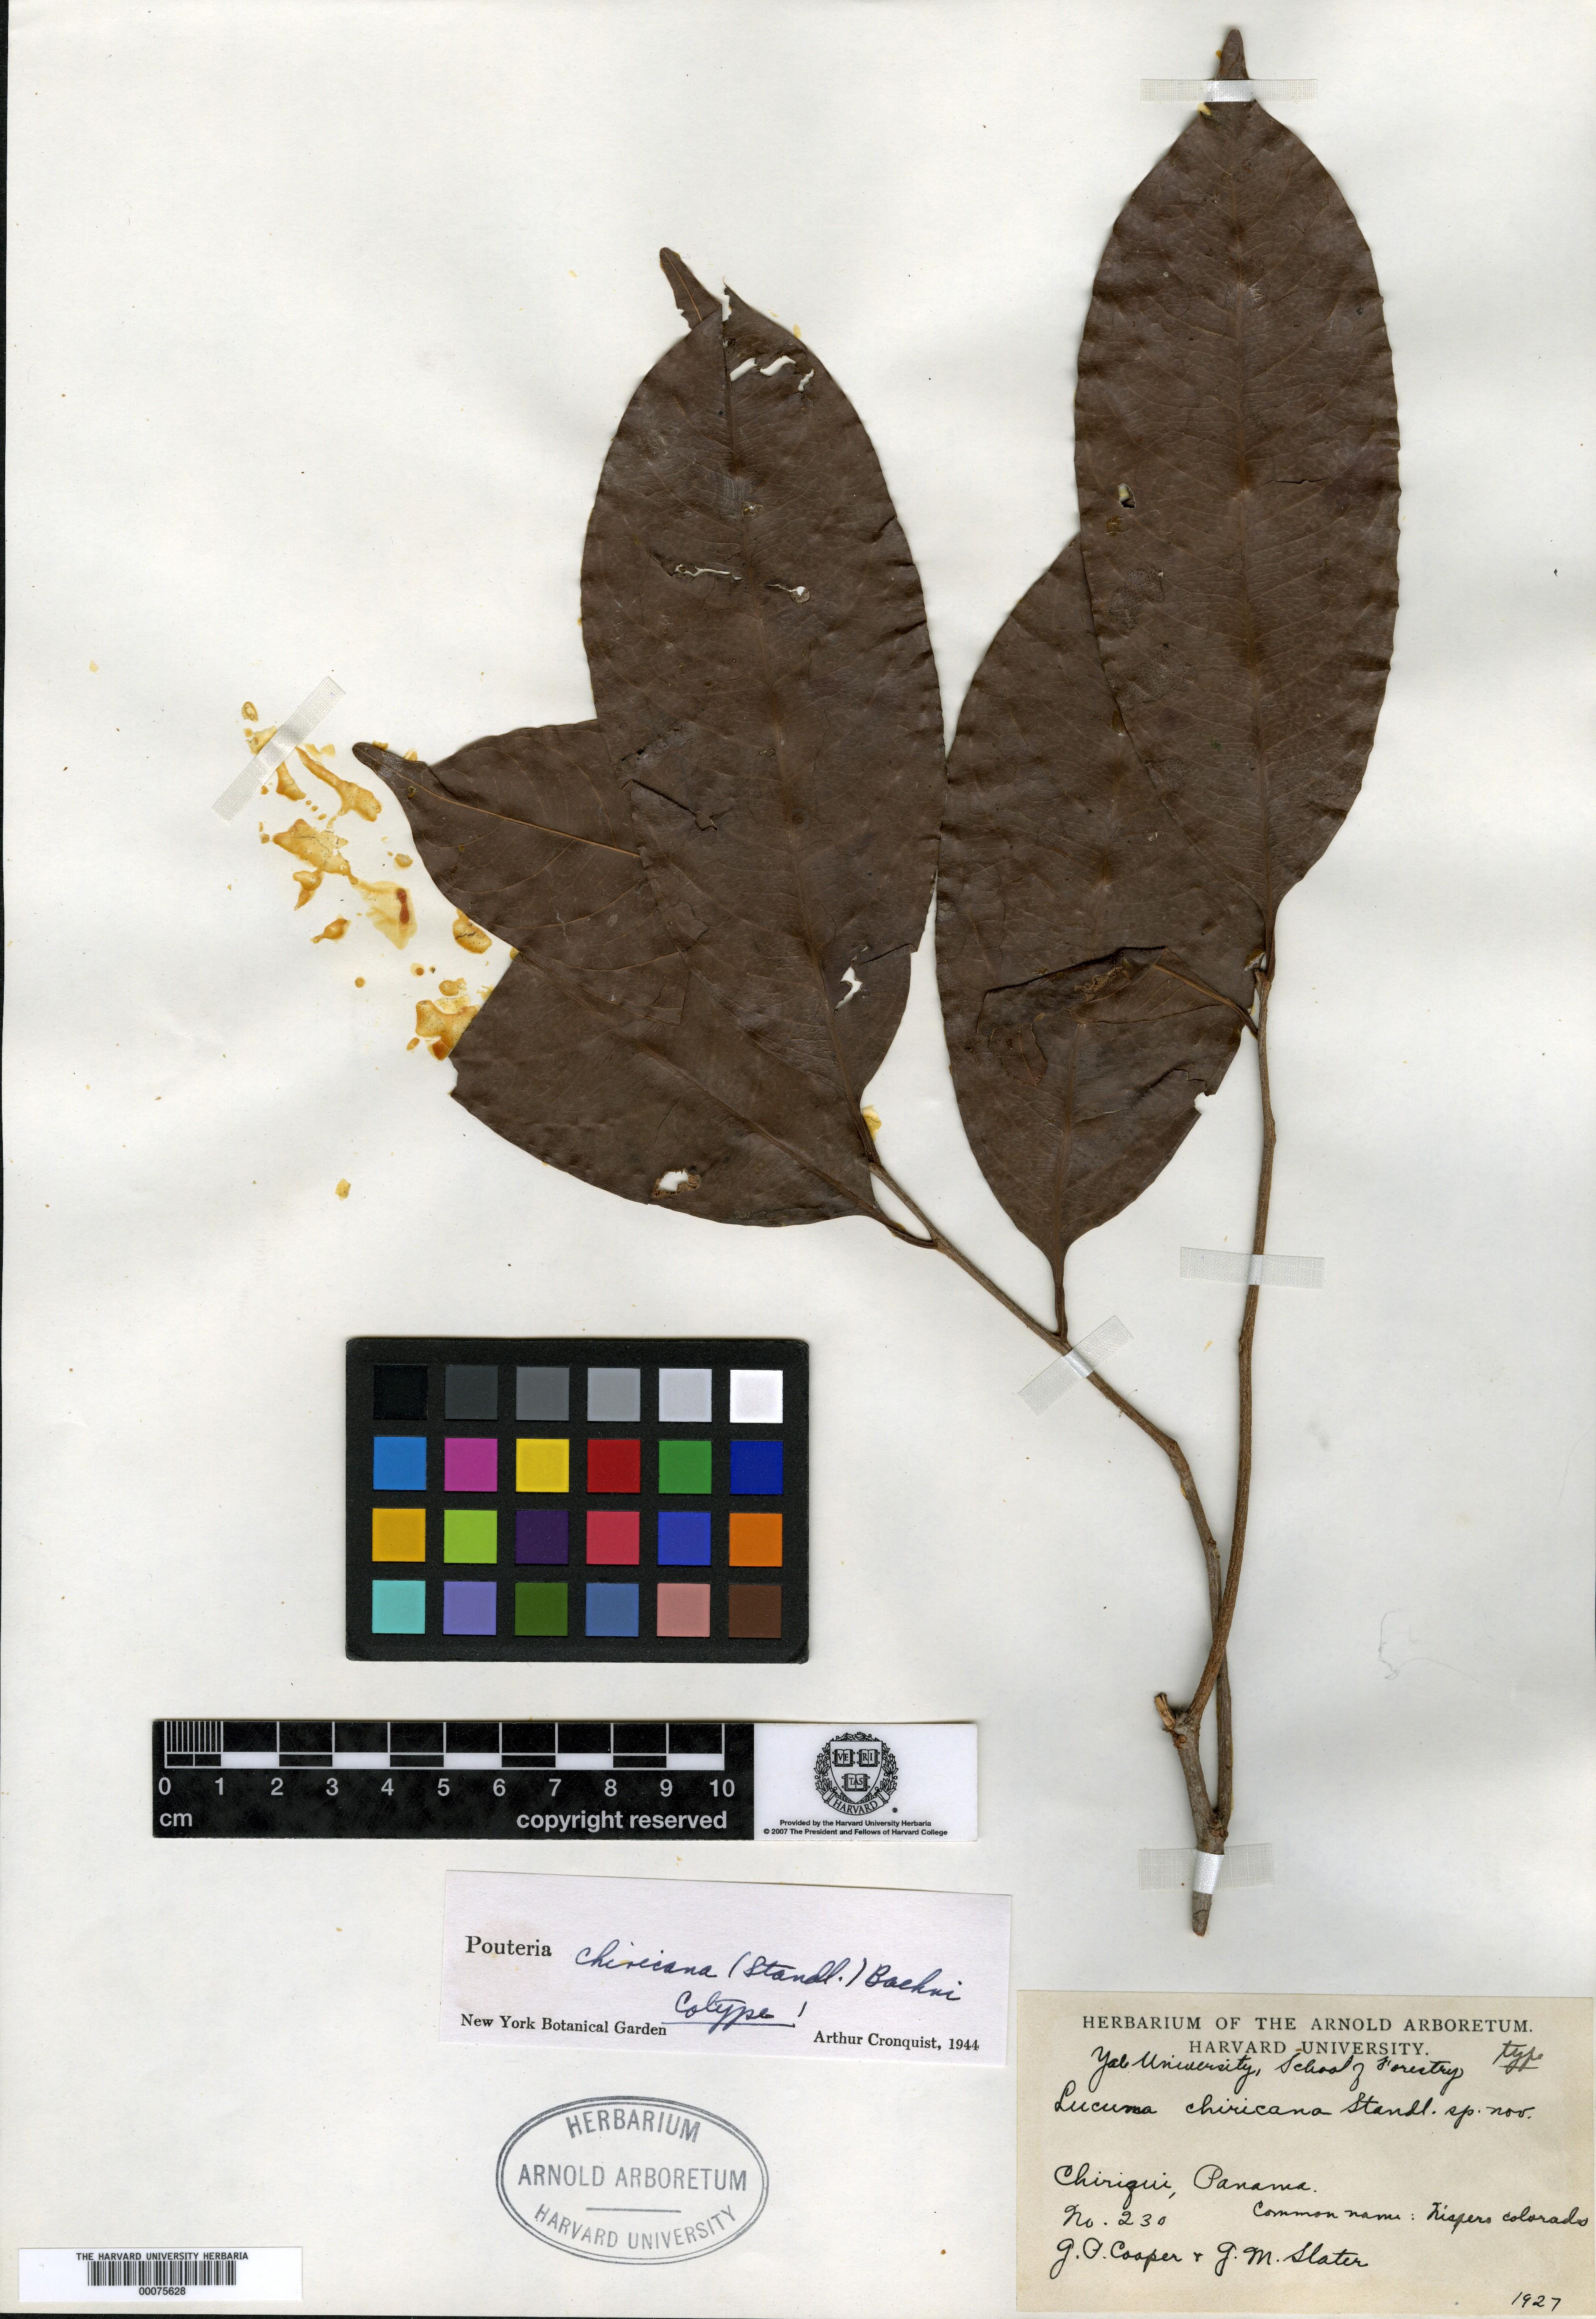 Pouteria chiricana image